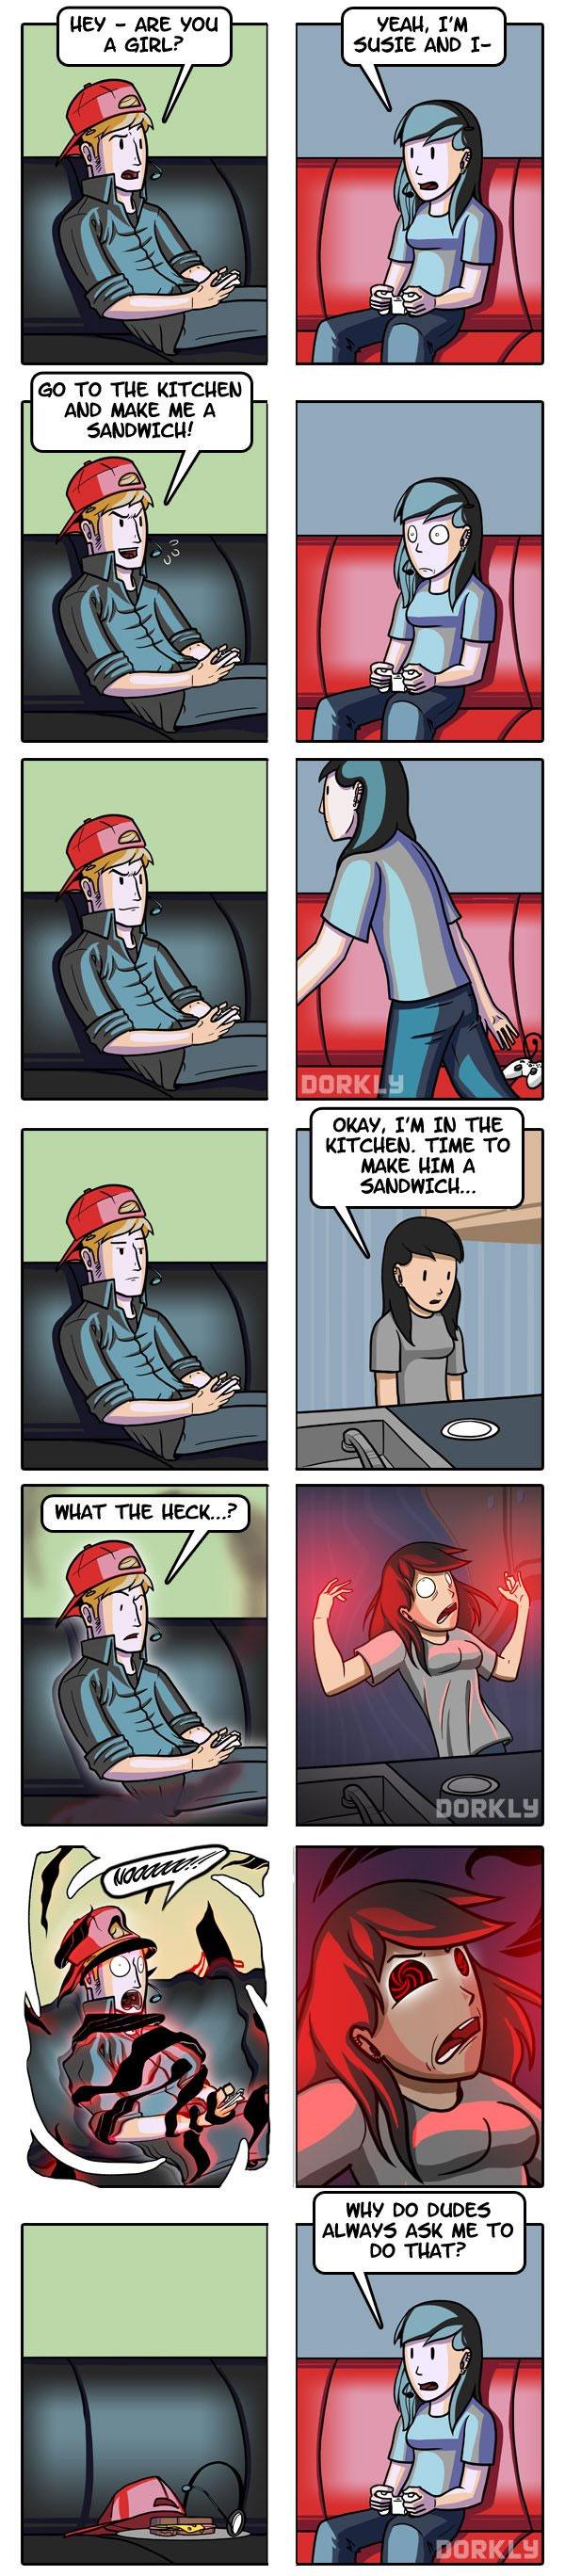 Xbox Live Demands